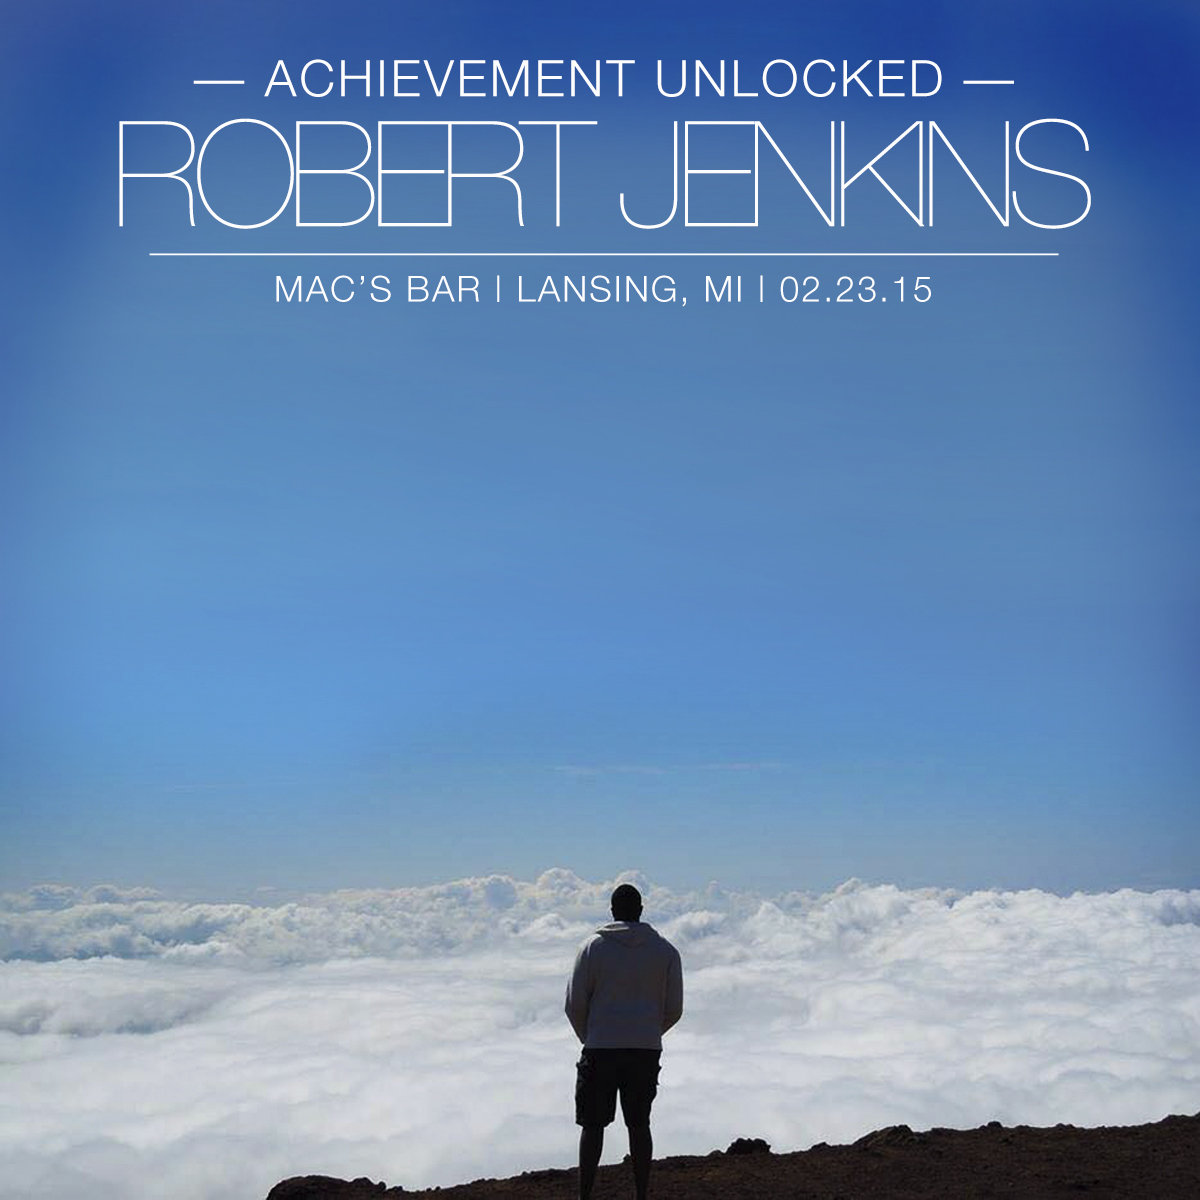 Achievement Unlocked Robert Jenkins